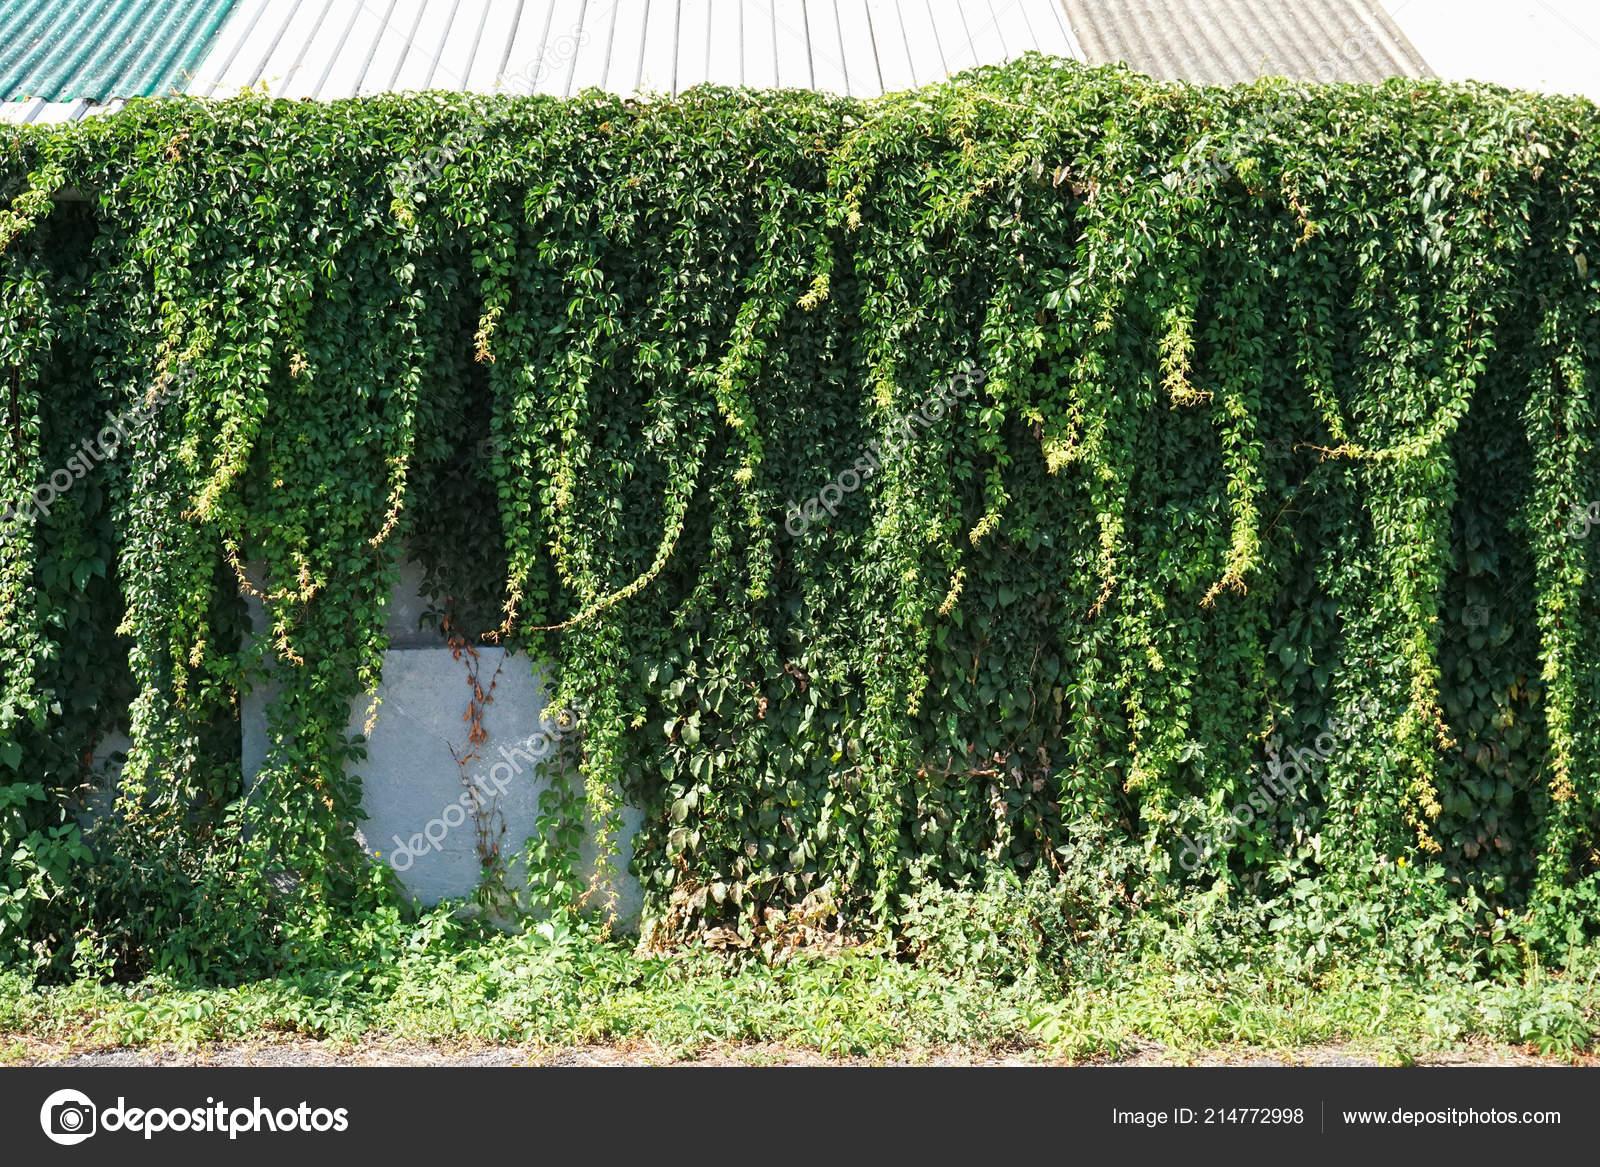 Climbing Plants Wall Building Stock Photo C Majorosl66 214772998